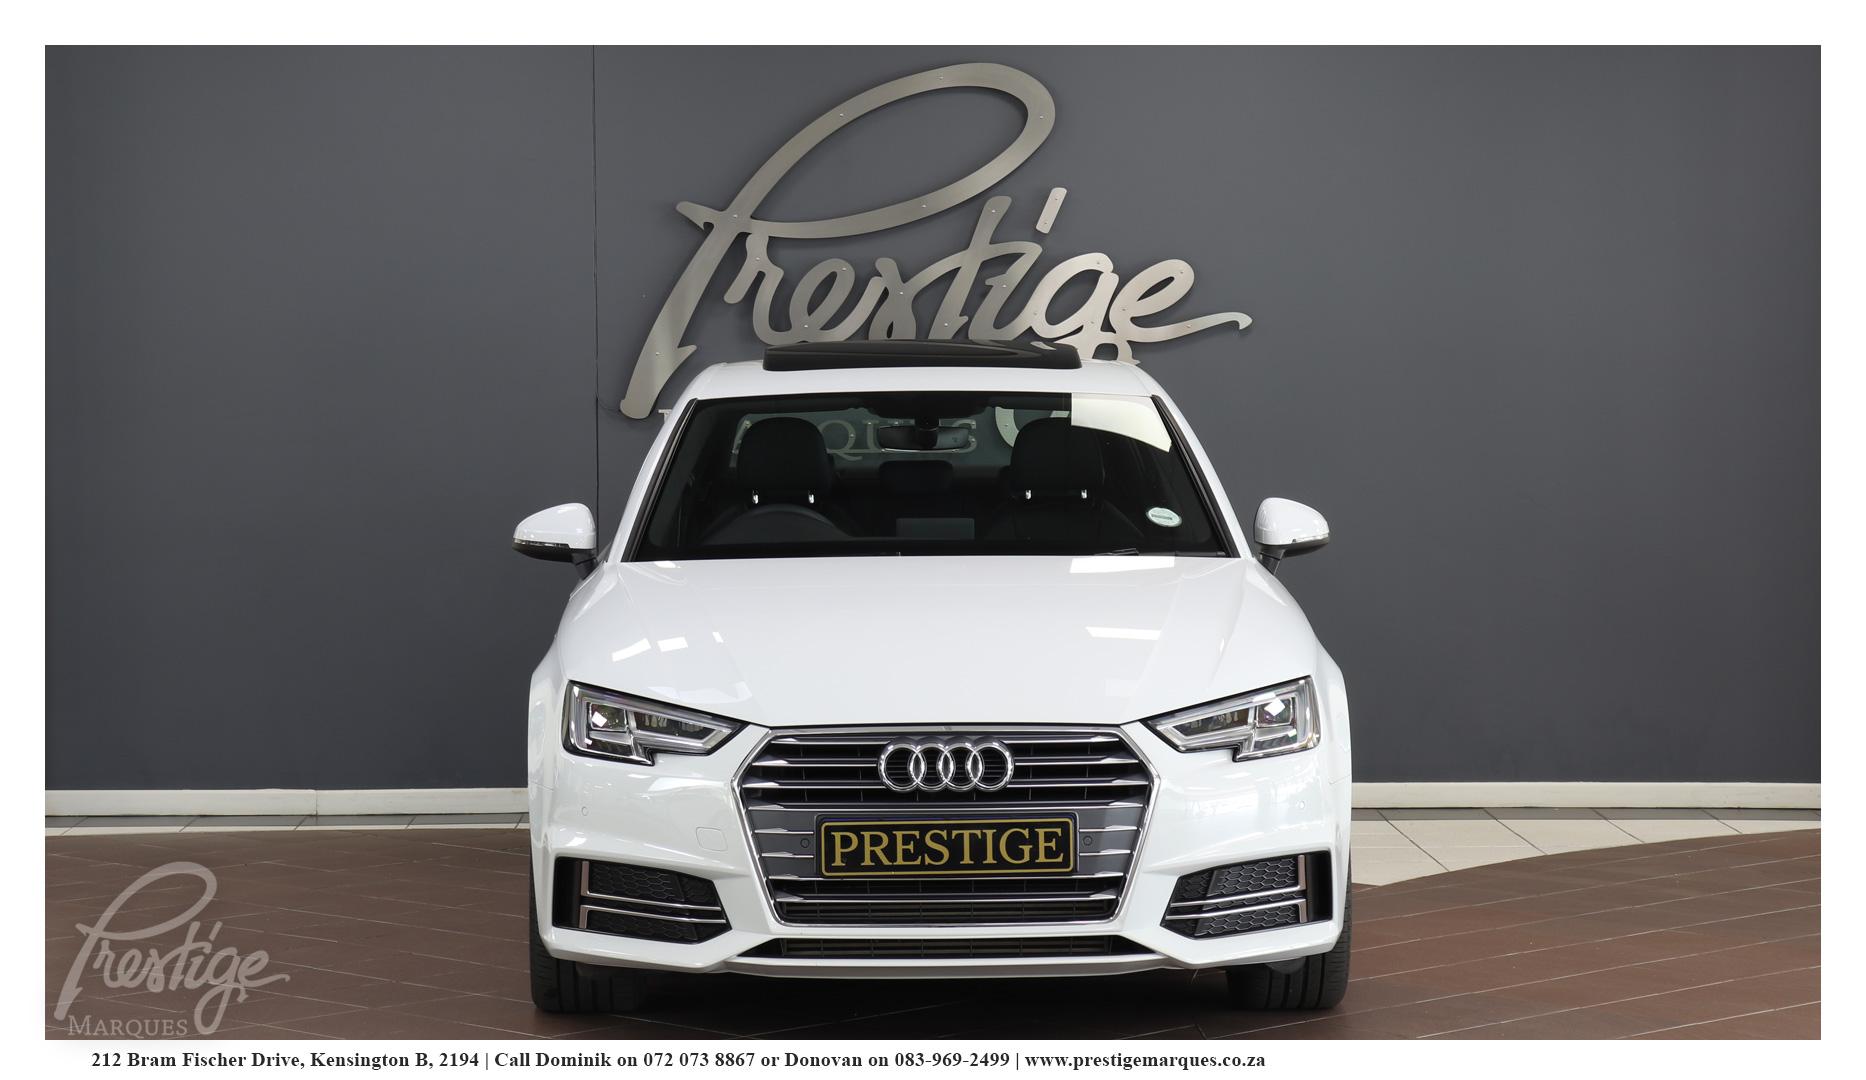 2018-Audi-A4-20-TFSI-STRONIC-Prestige-Marques-8